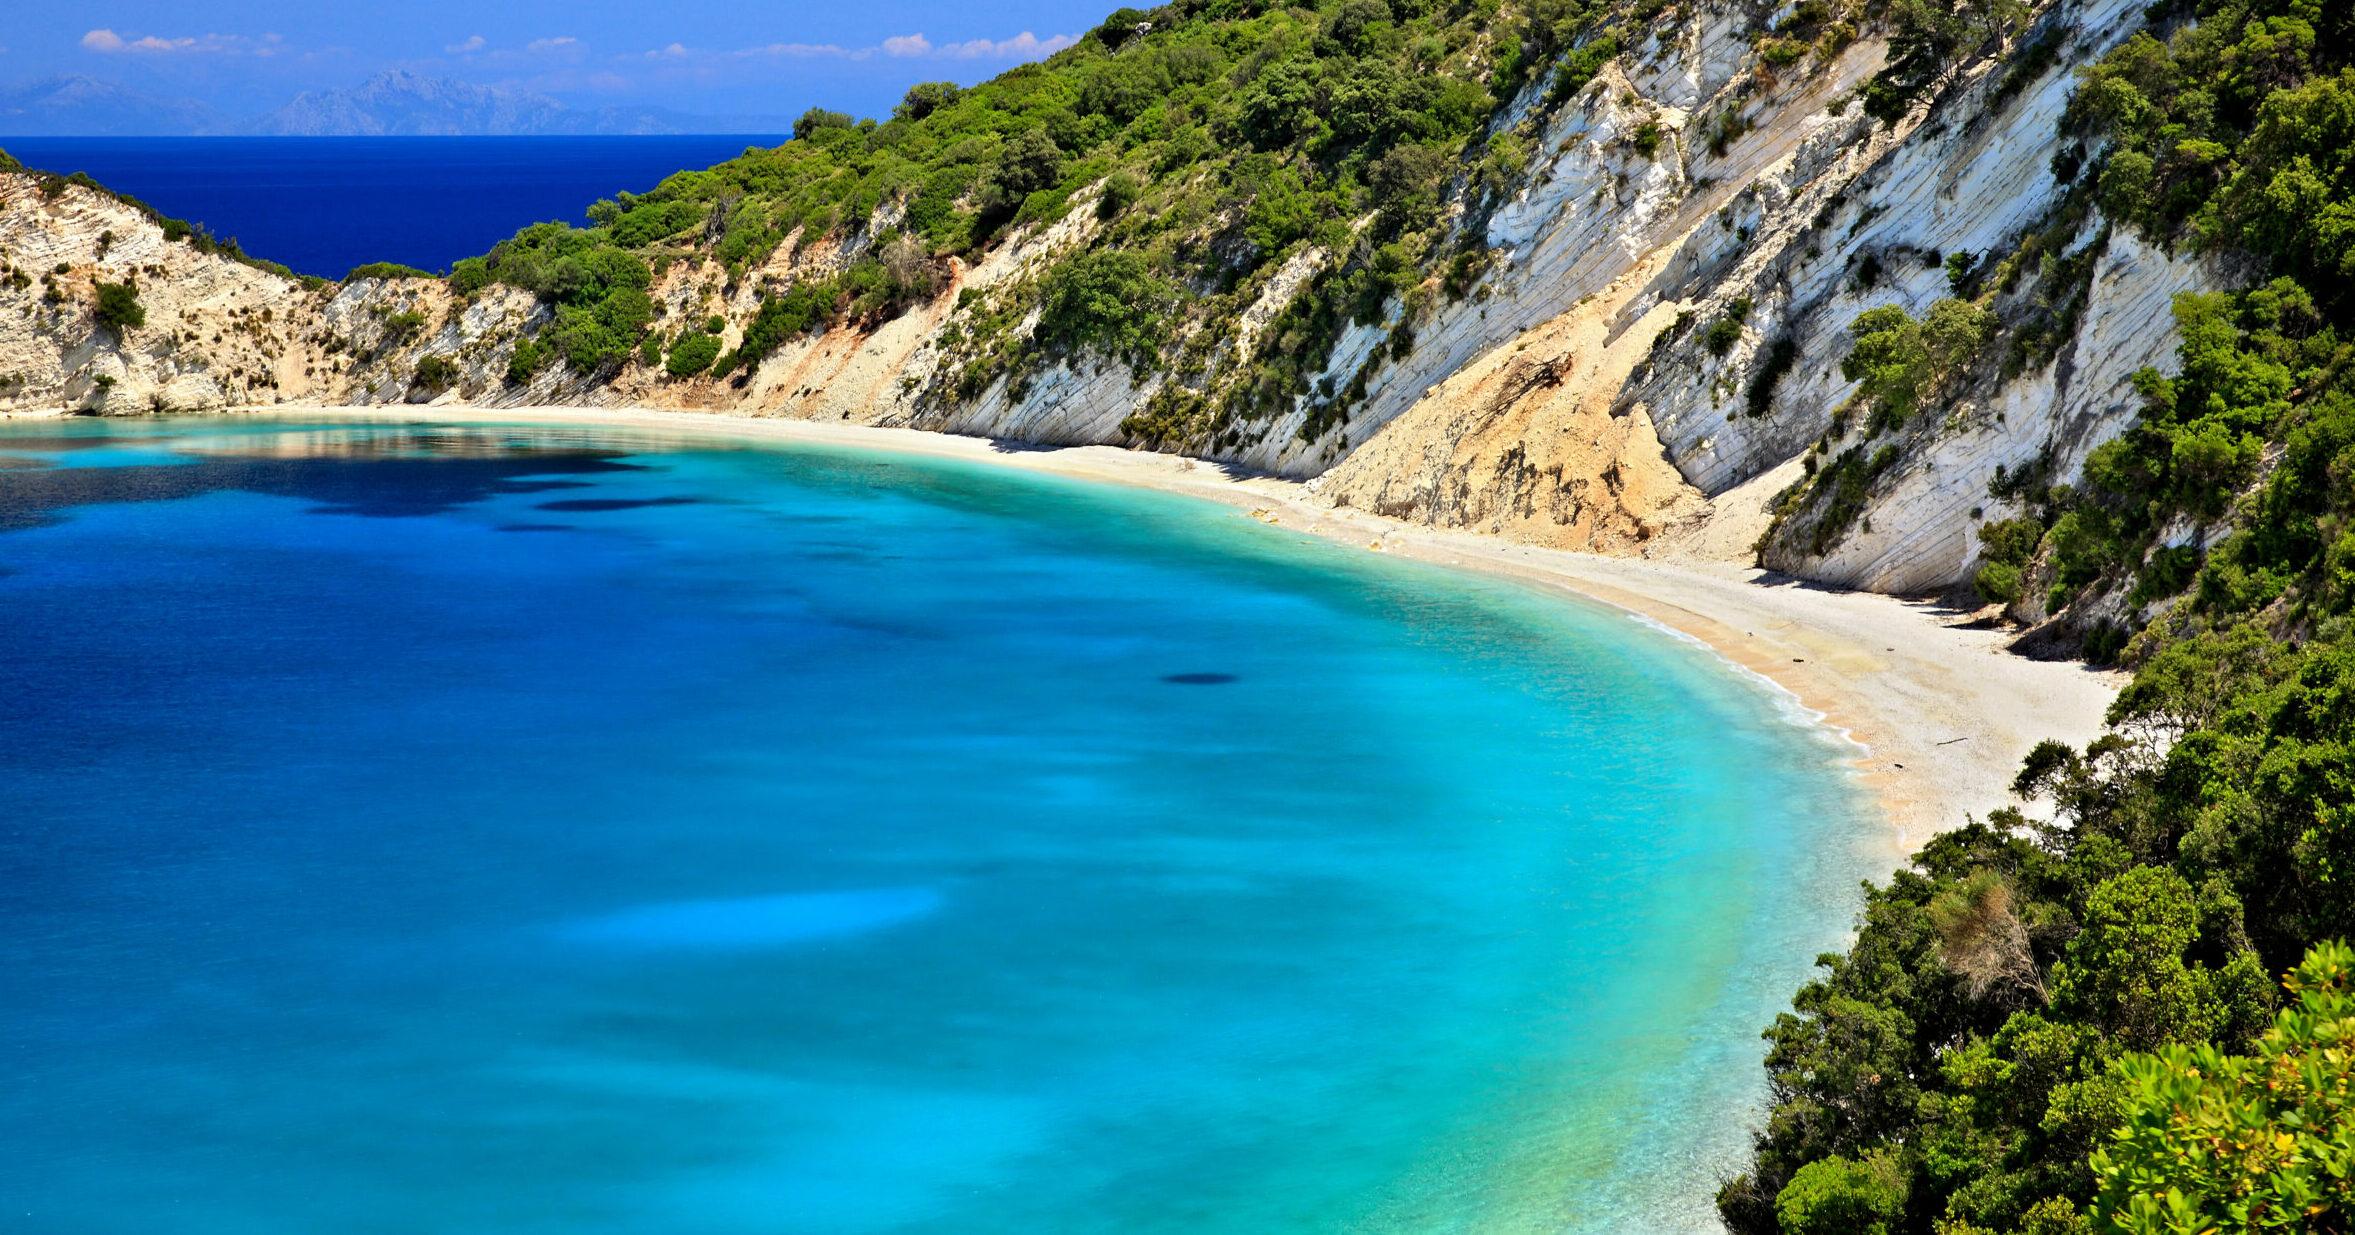 Ionian Islands: Ithaca, Gidaki – The blue beach that looks like paradise